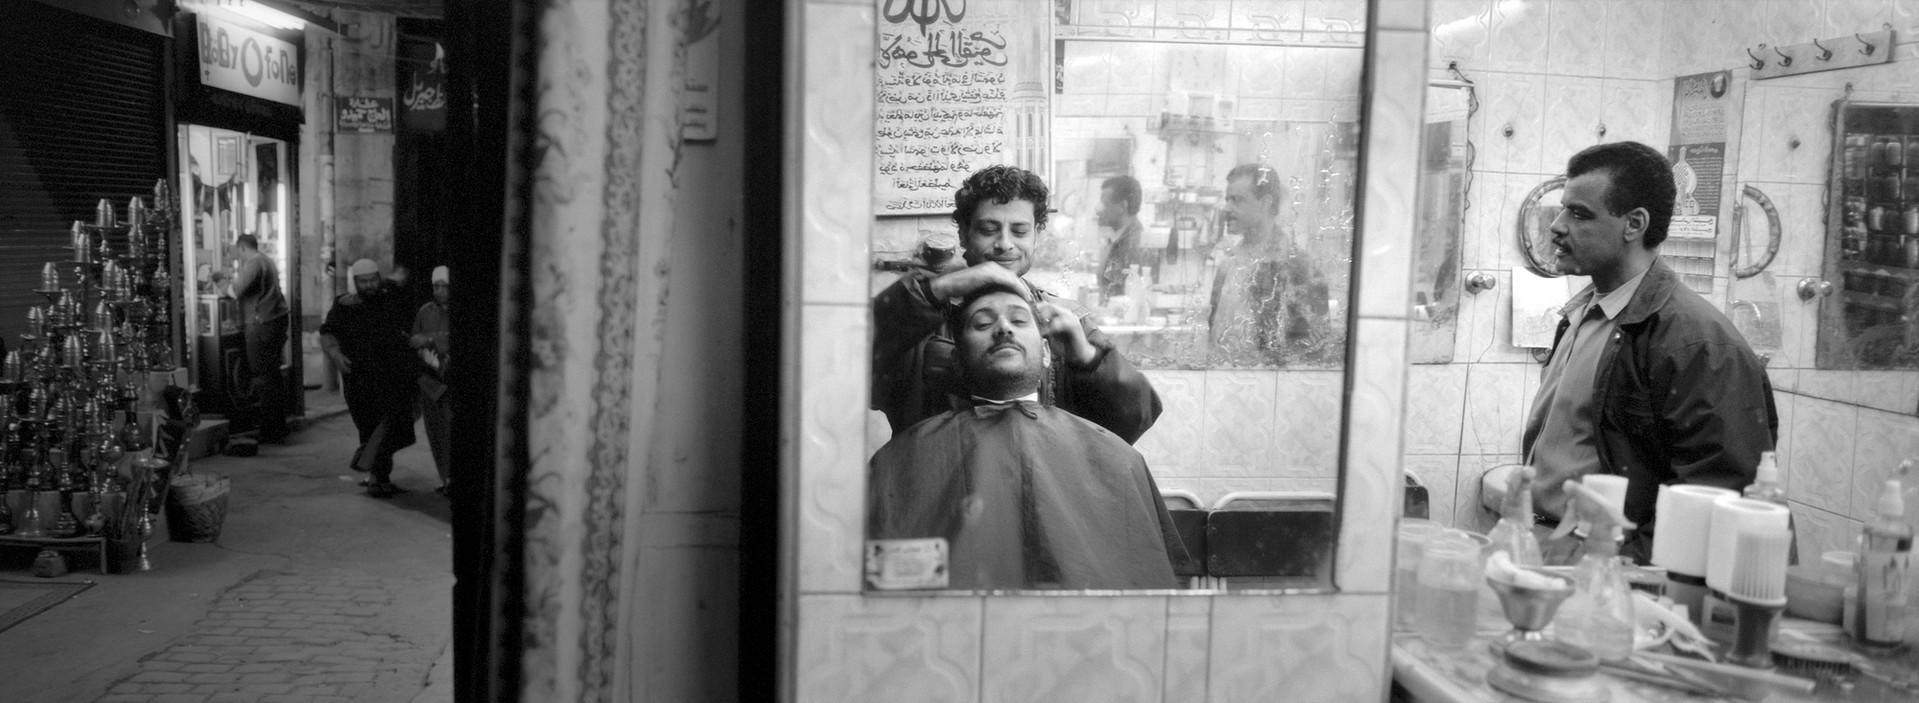 Mirror, Aswan, Egypt 2006